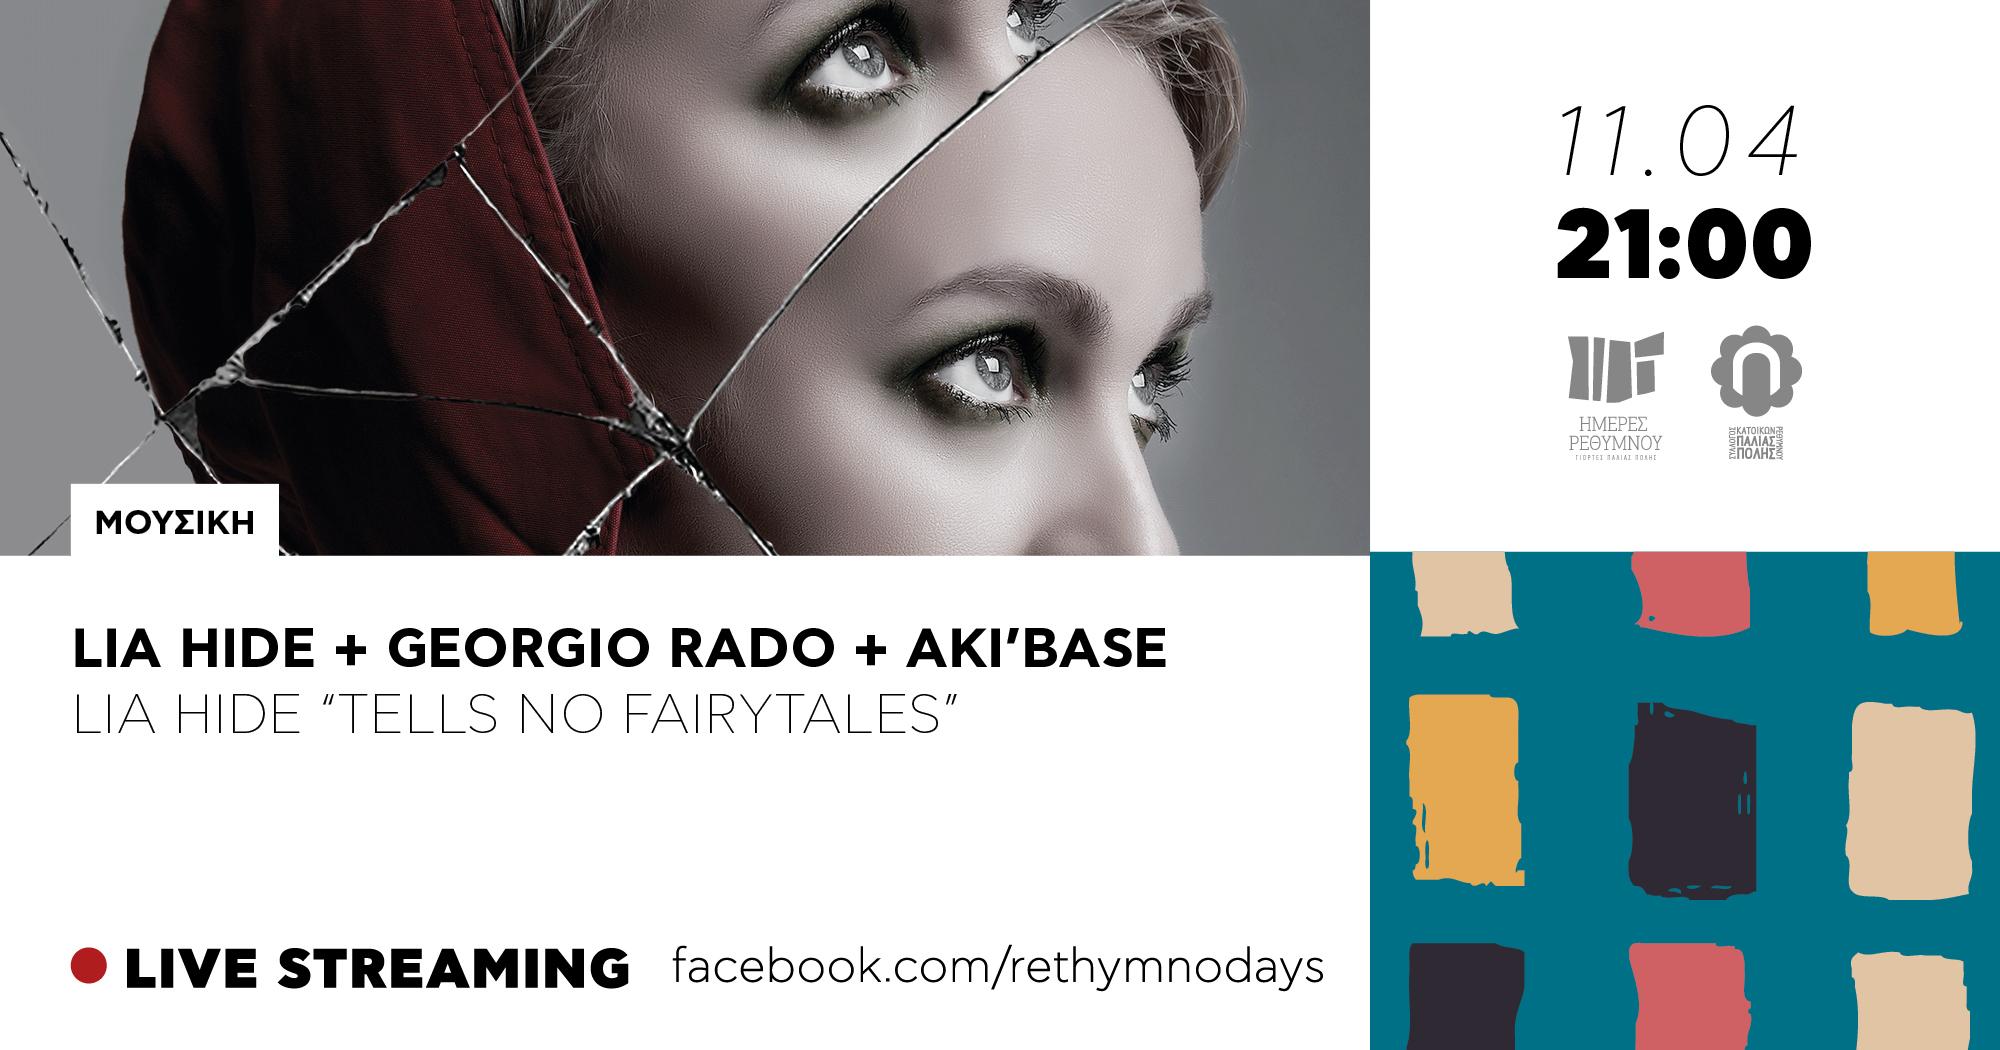 "Lia Hide + Georgio Rado + Aki'Base ""Tells No Fairytales"""